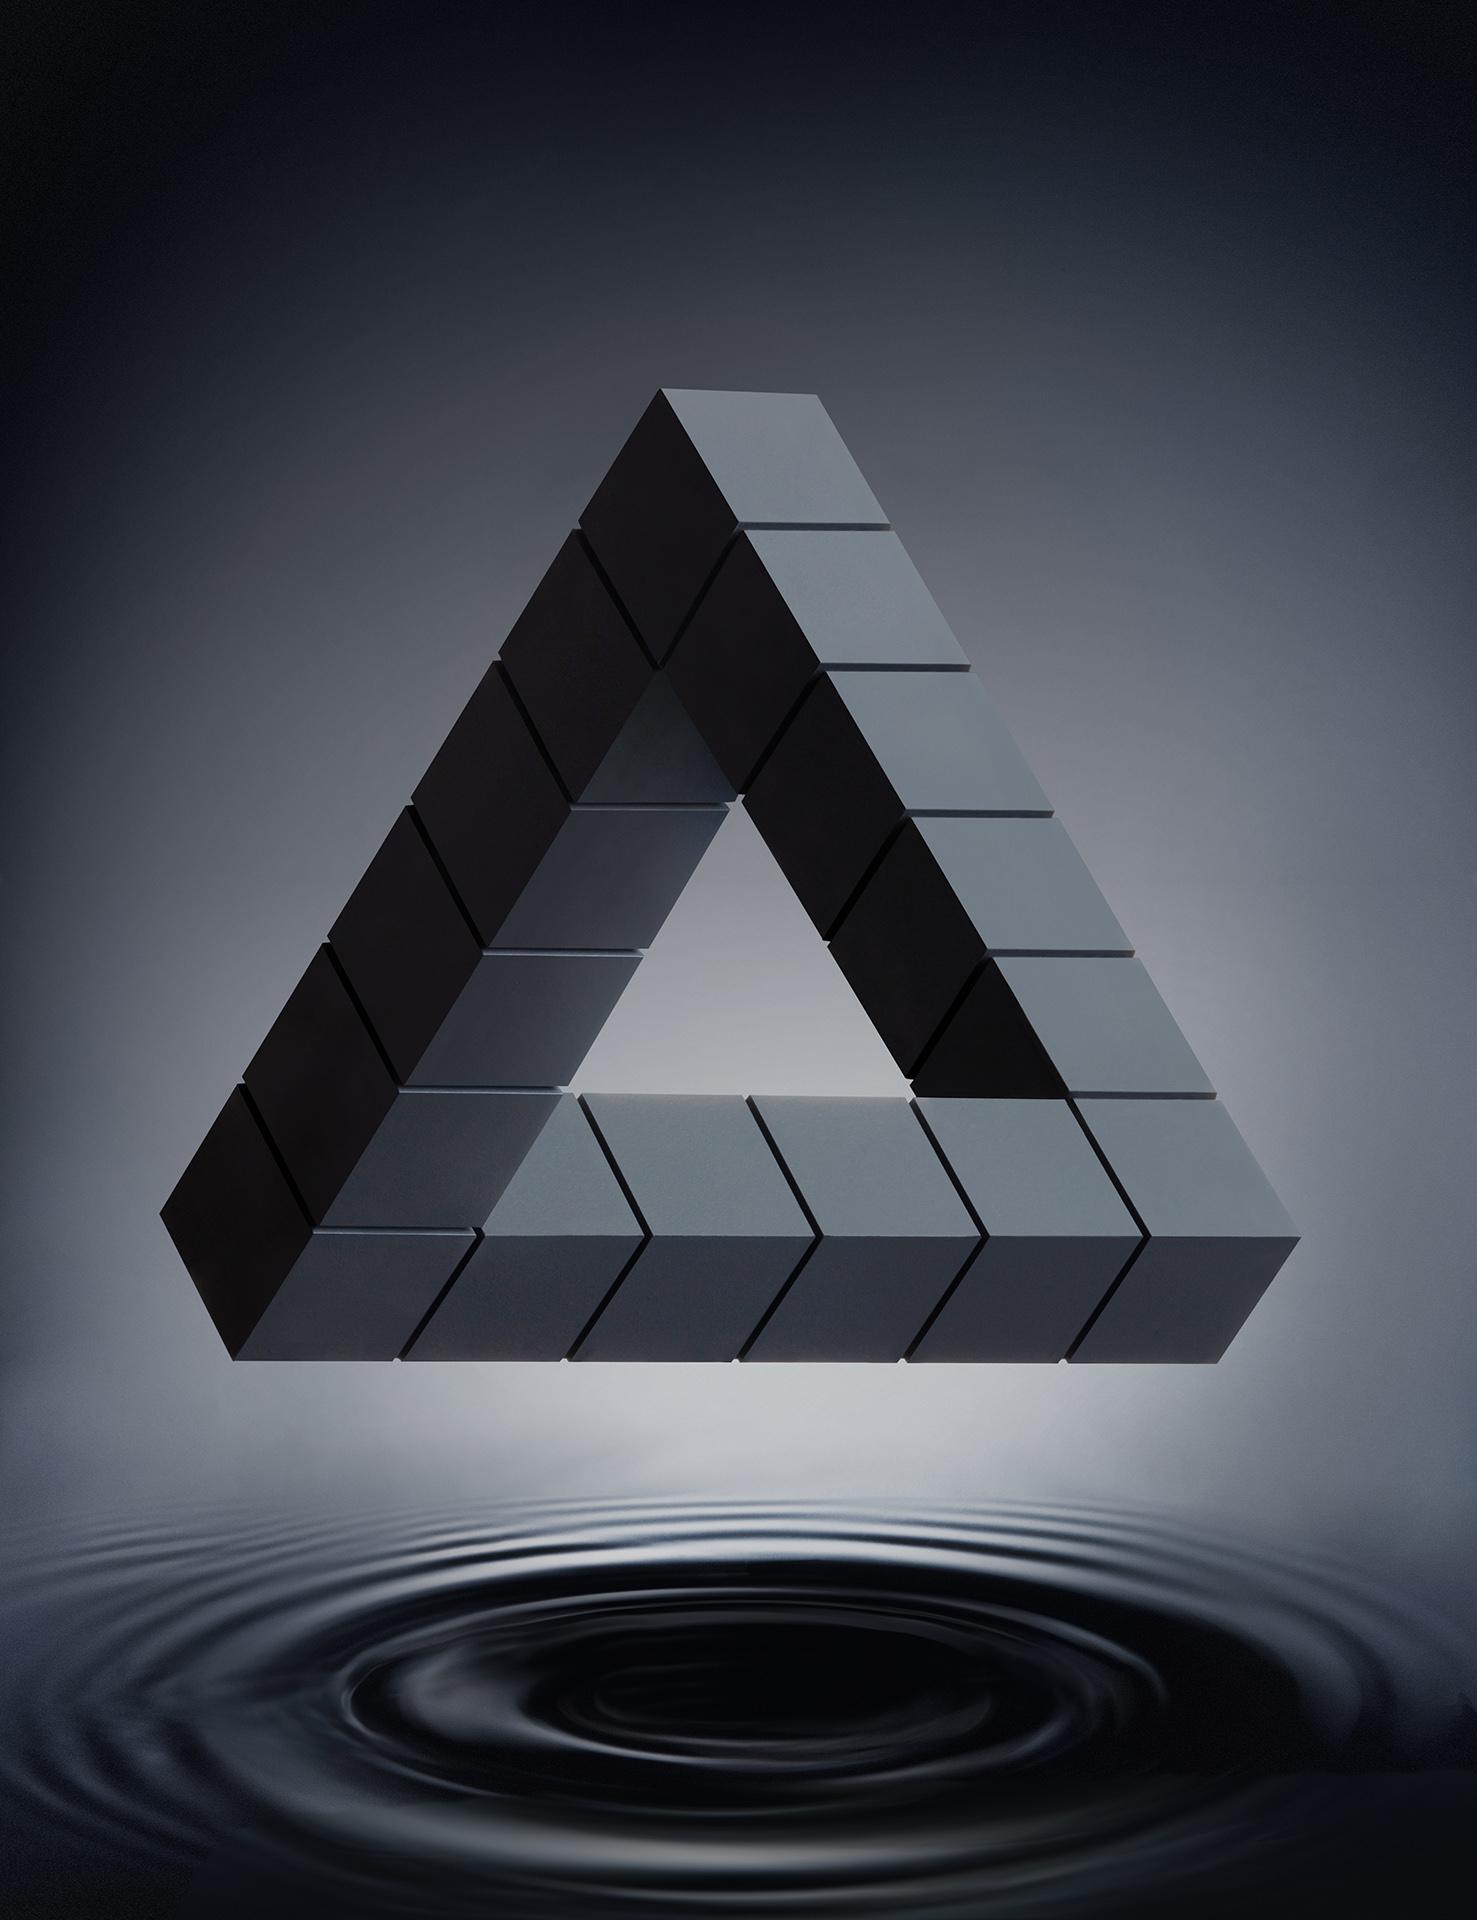 escher-impossible-shape-illusion-creative-still-life-photography-london-photographer-1